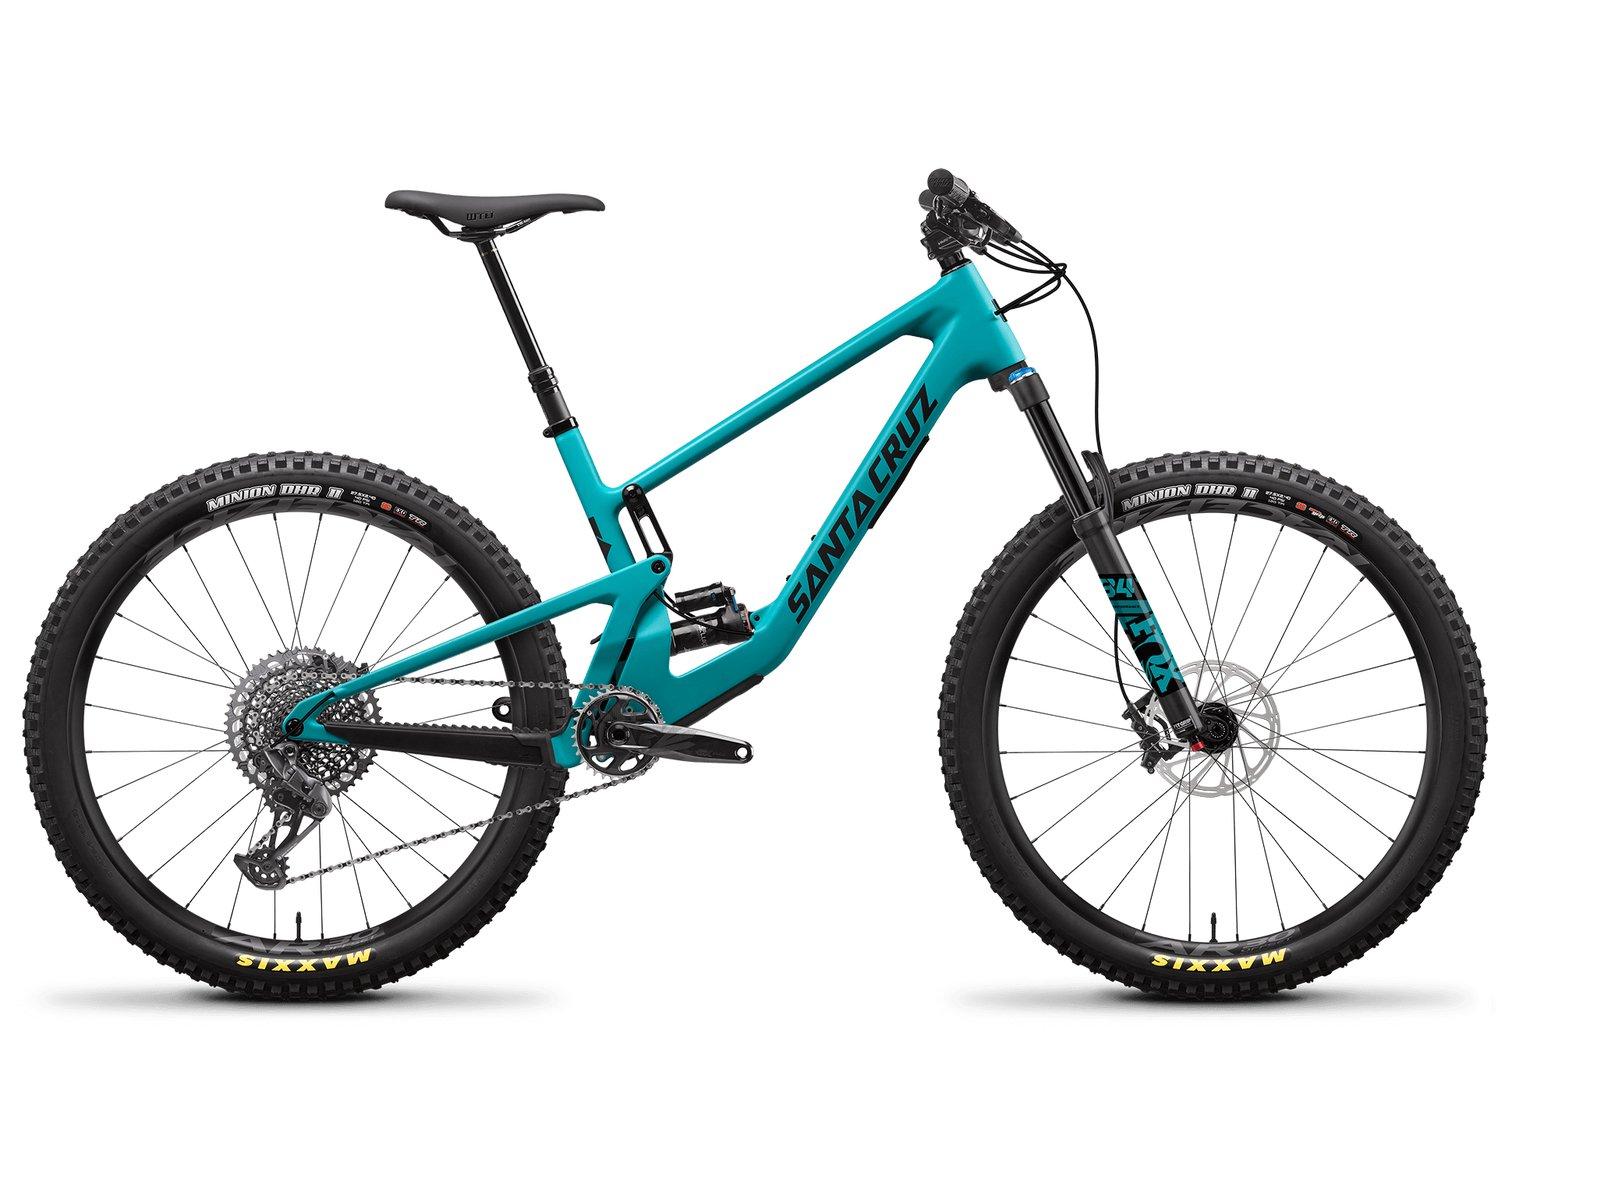 Mountain Bike Sedona